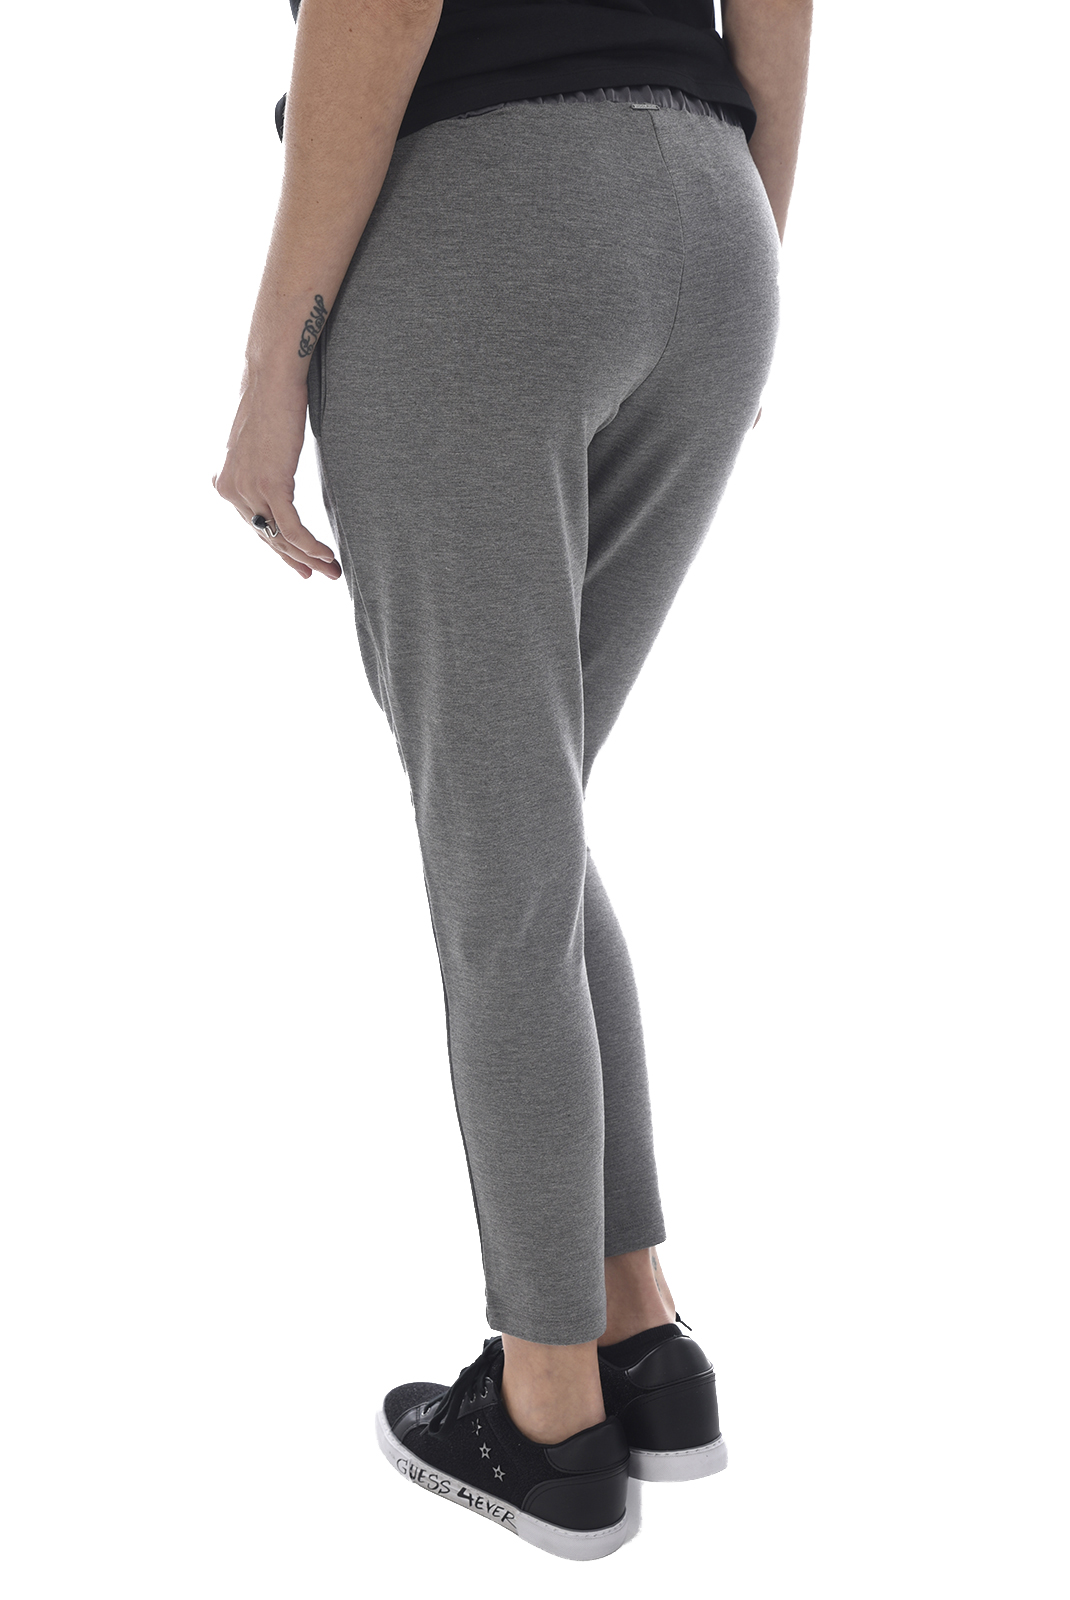 Gris 1692 Wwpan1092 Pantalons Woolrich Femme vfbg6Y7y